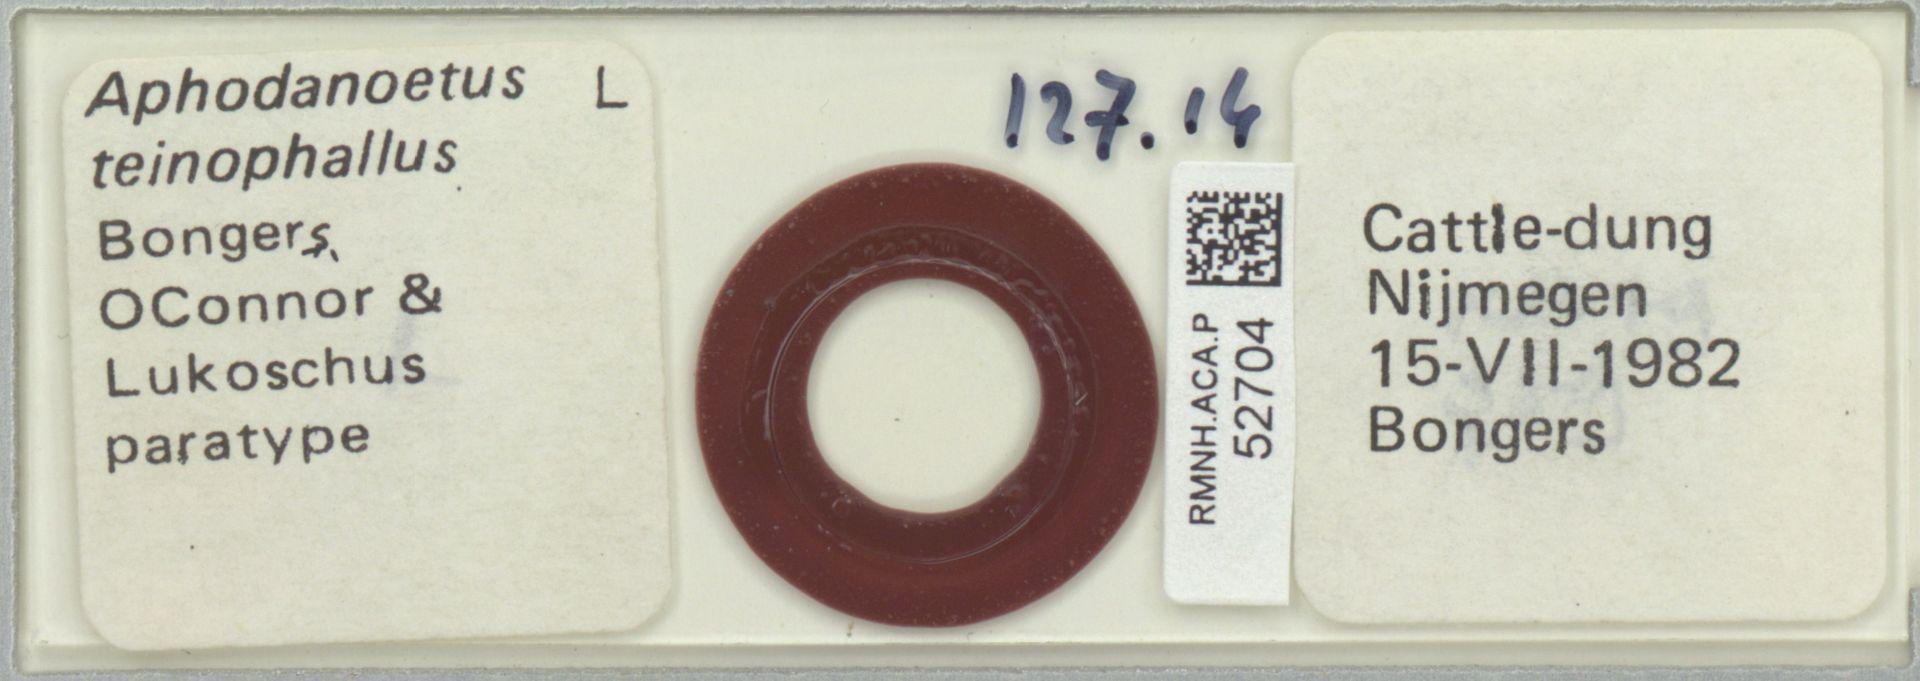 RMNH.ACA.P.52704 | Aphodanoetus teinophallus Bongers, OConnor & Lukoschus